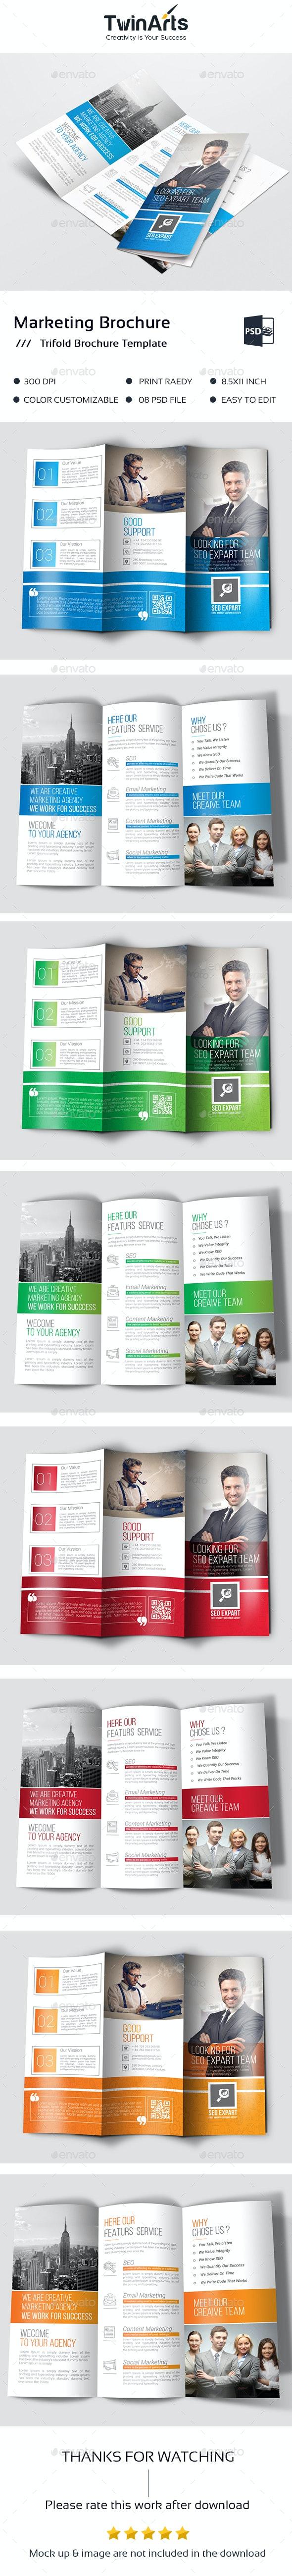 Marketing Trifold Brochure - Brochures Print Templates